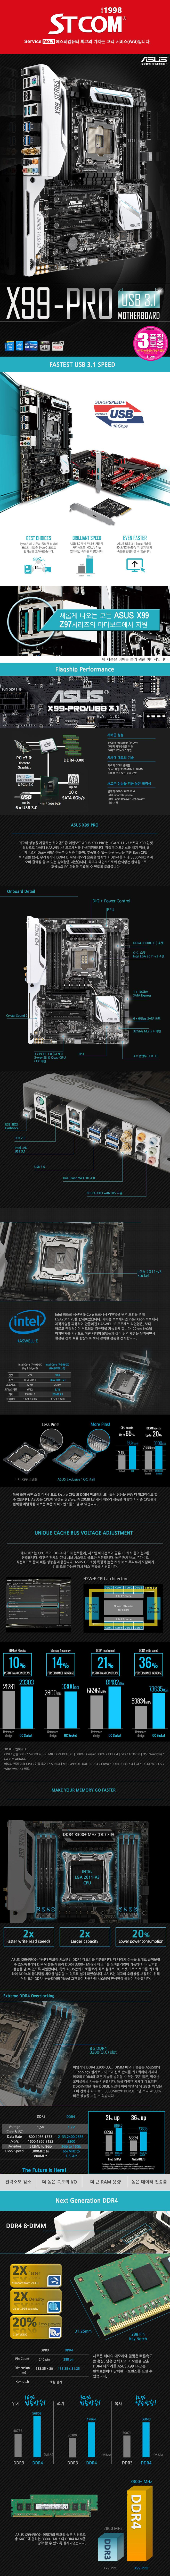 X99-Pro_USB31_1